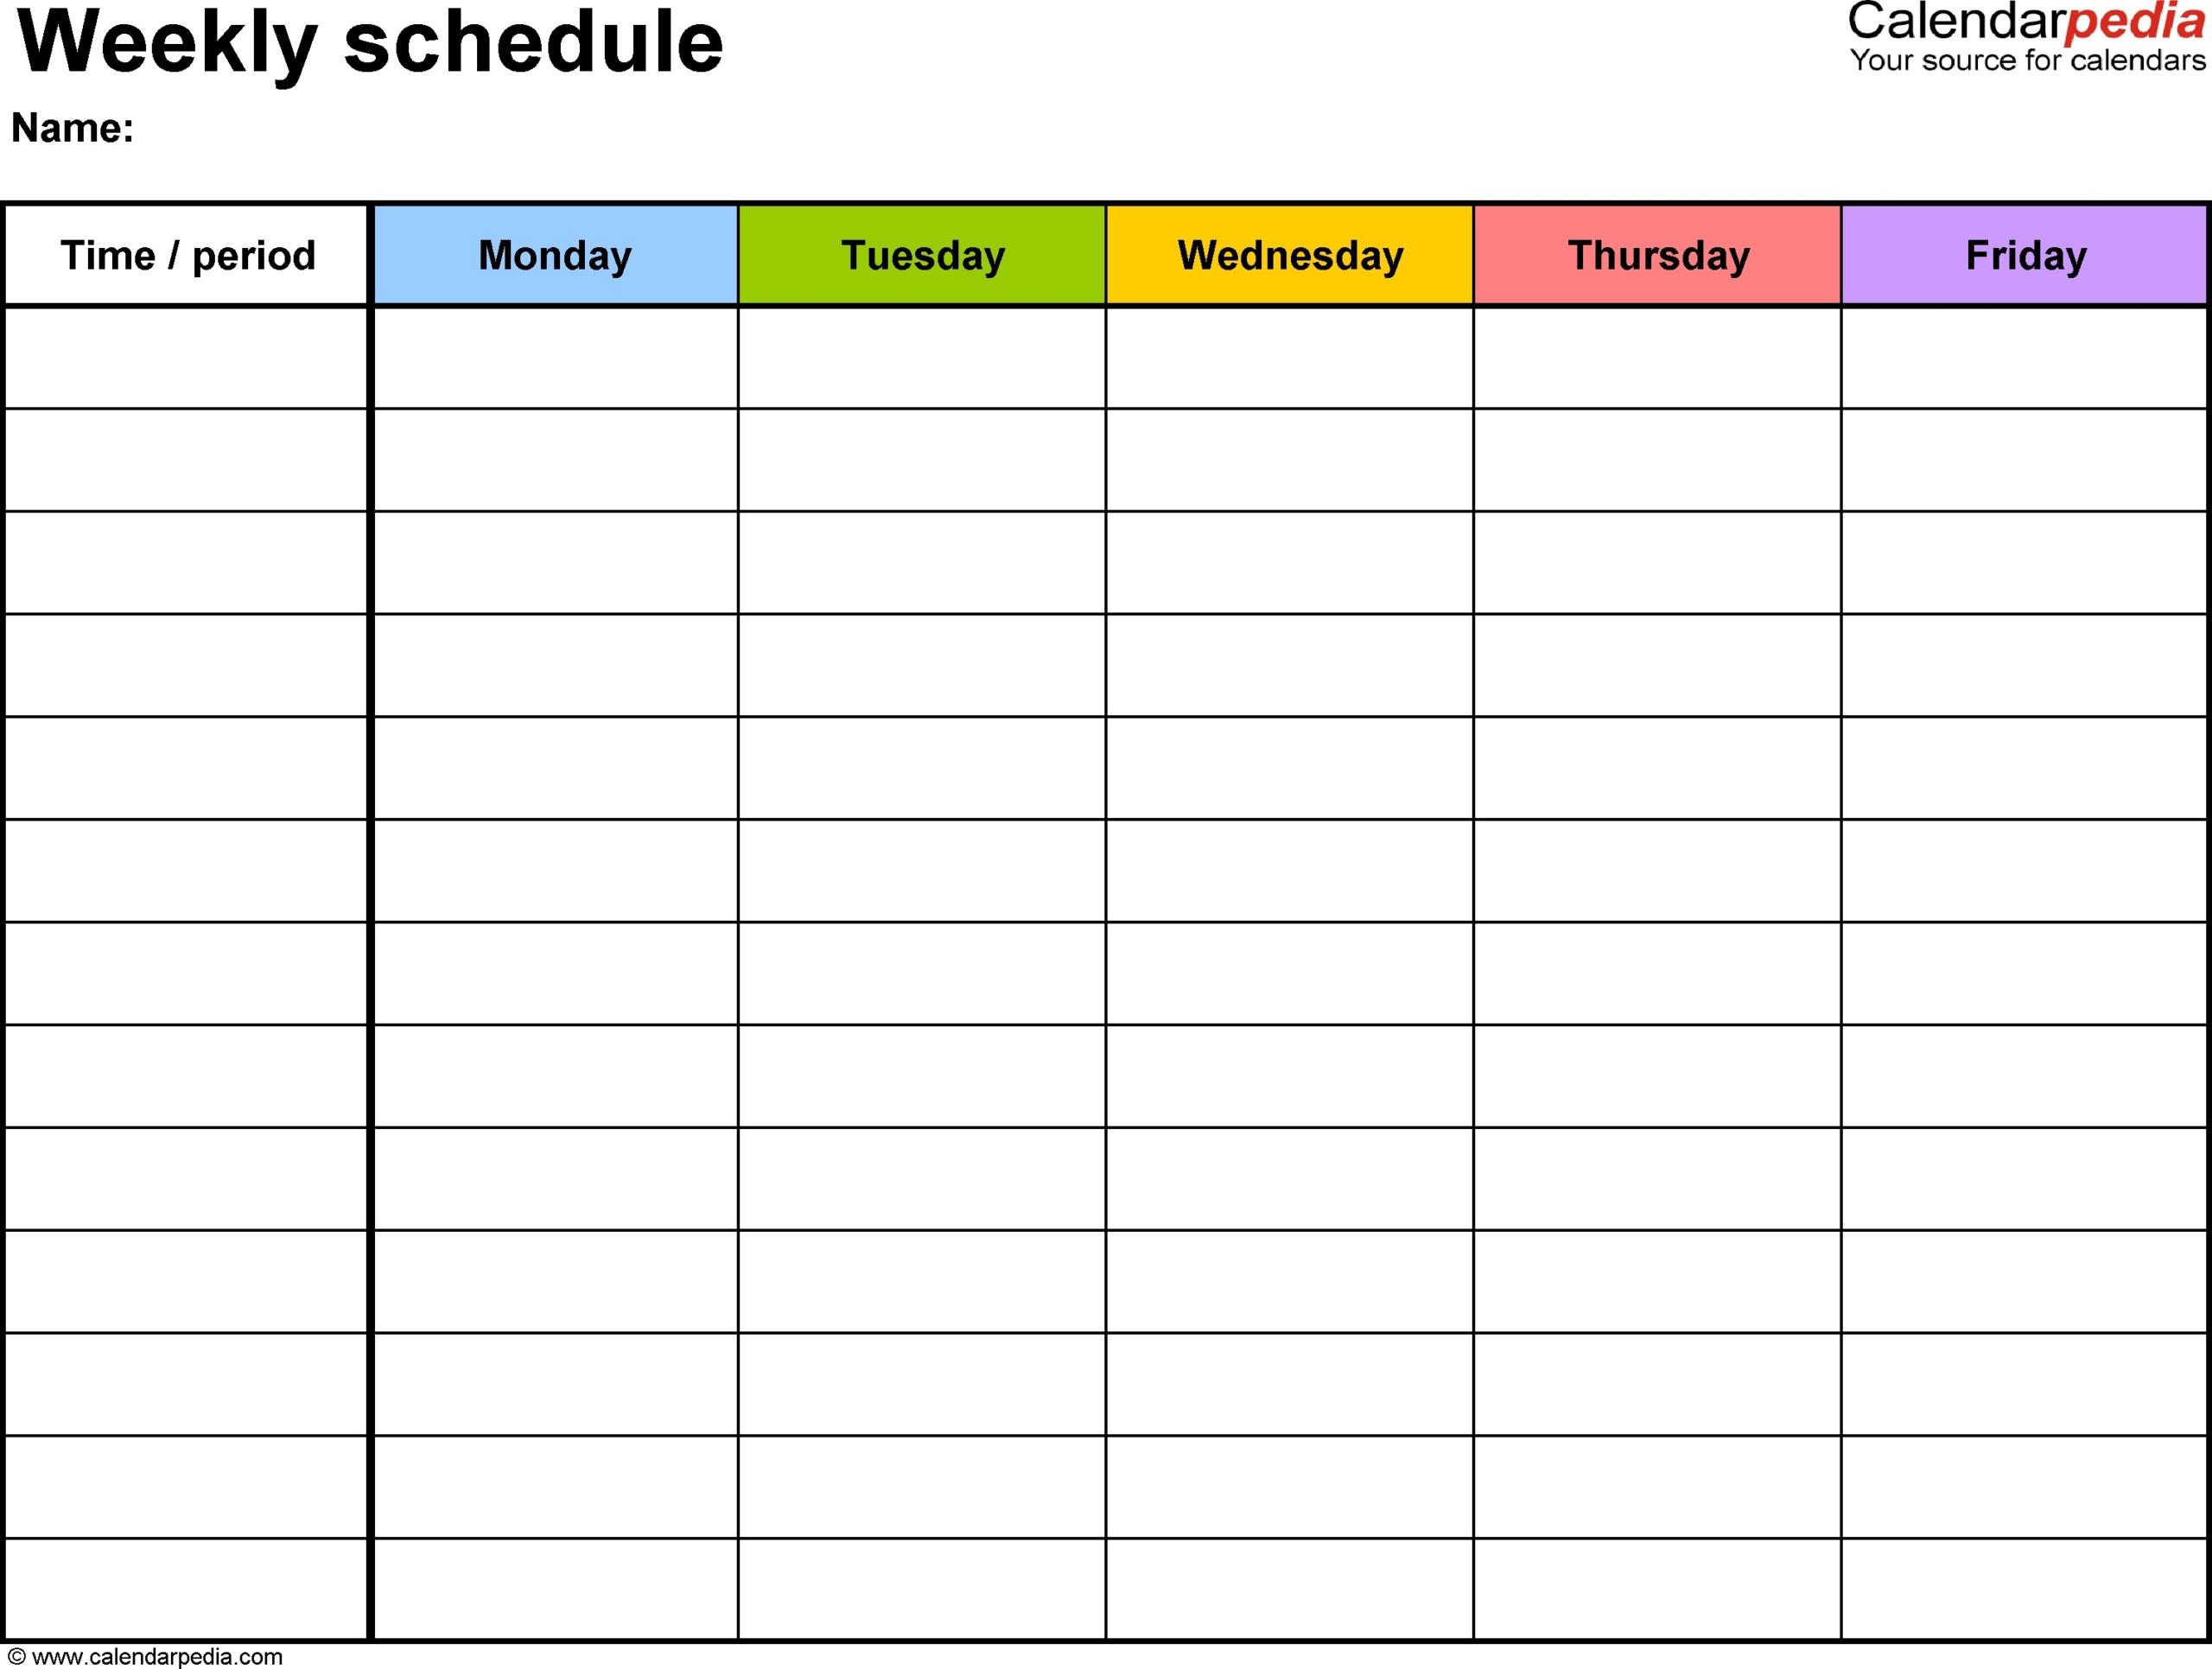 Blank Calendar With Time Slots | Calendar Template Printable  Printable Schedule With Time Slots